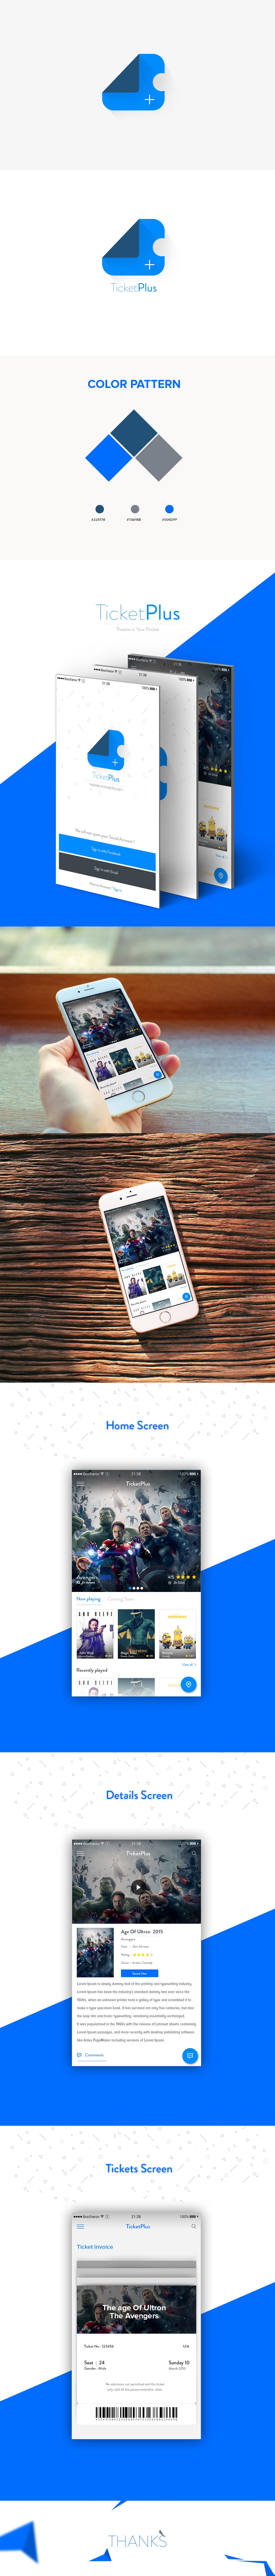 UI ux mobile movie flat mobileapp mobileui ios android lollipop Materialdesign materialui flatdesign flatui phone